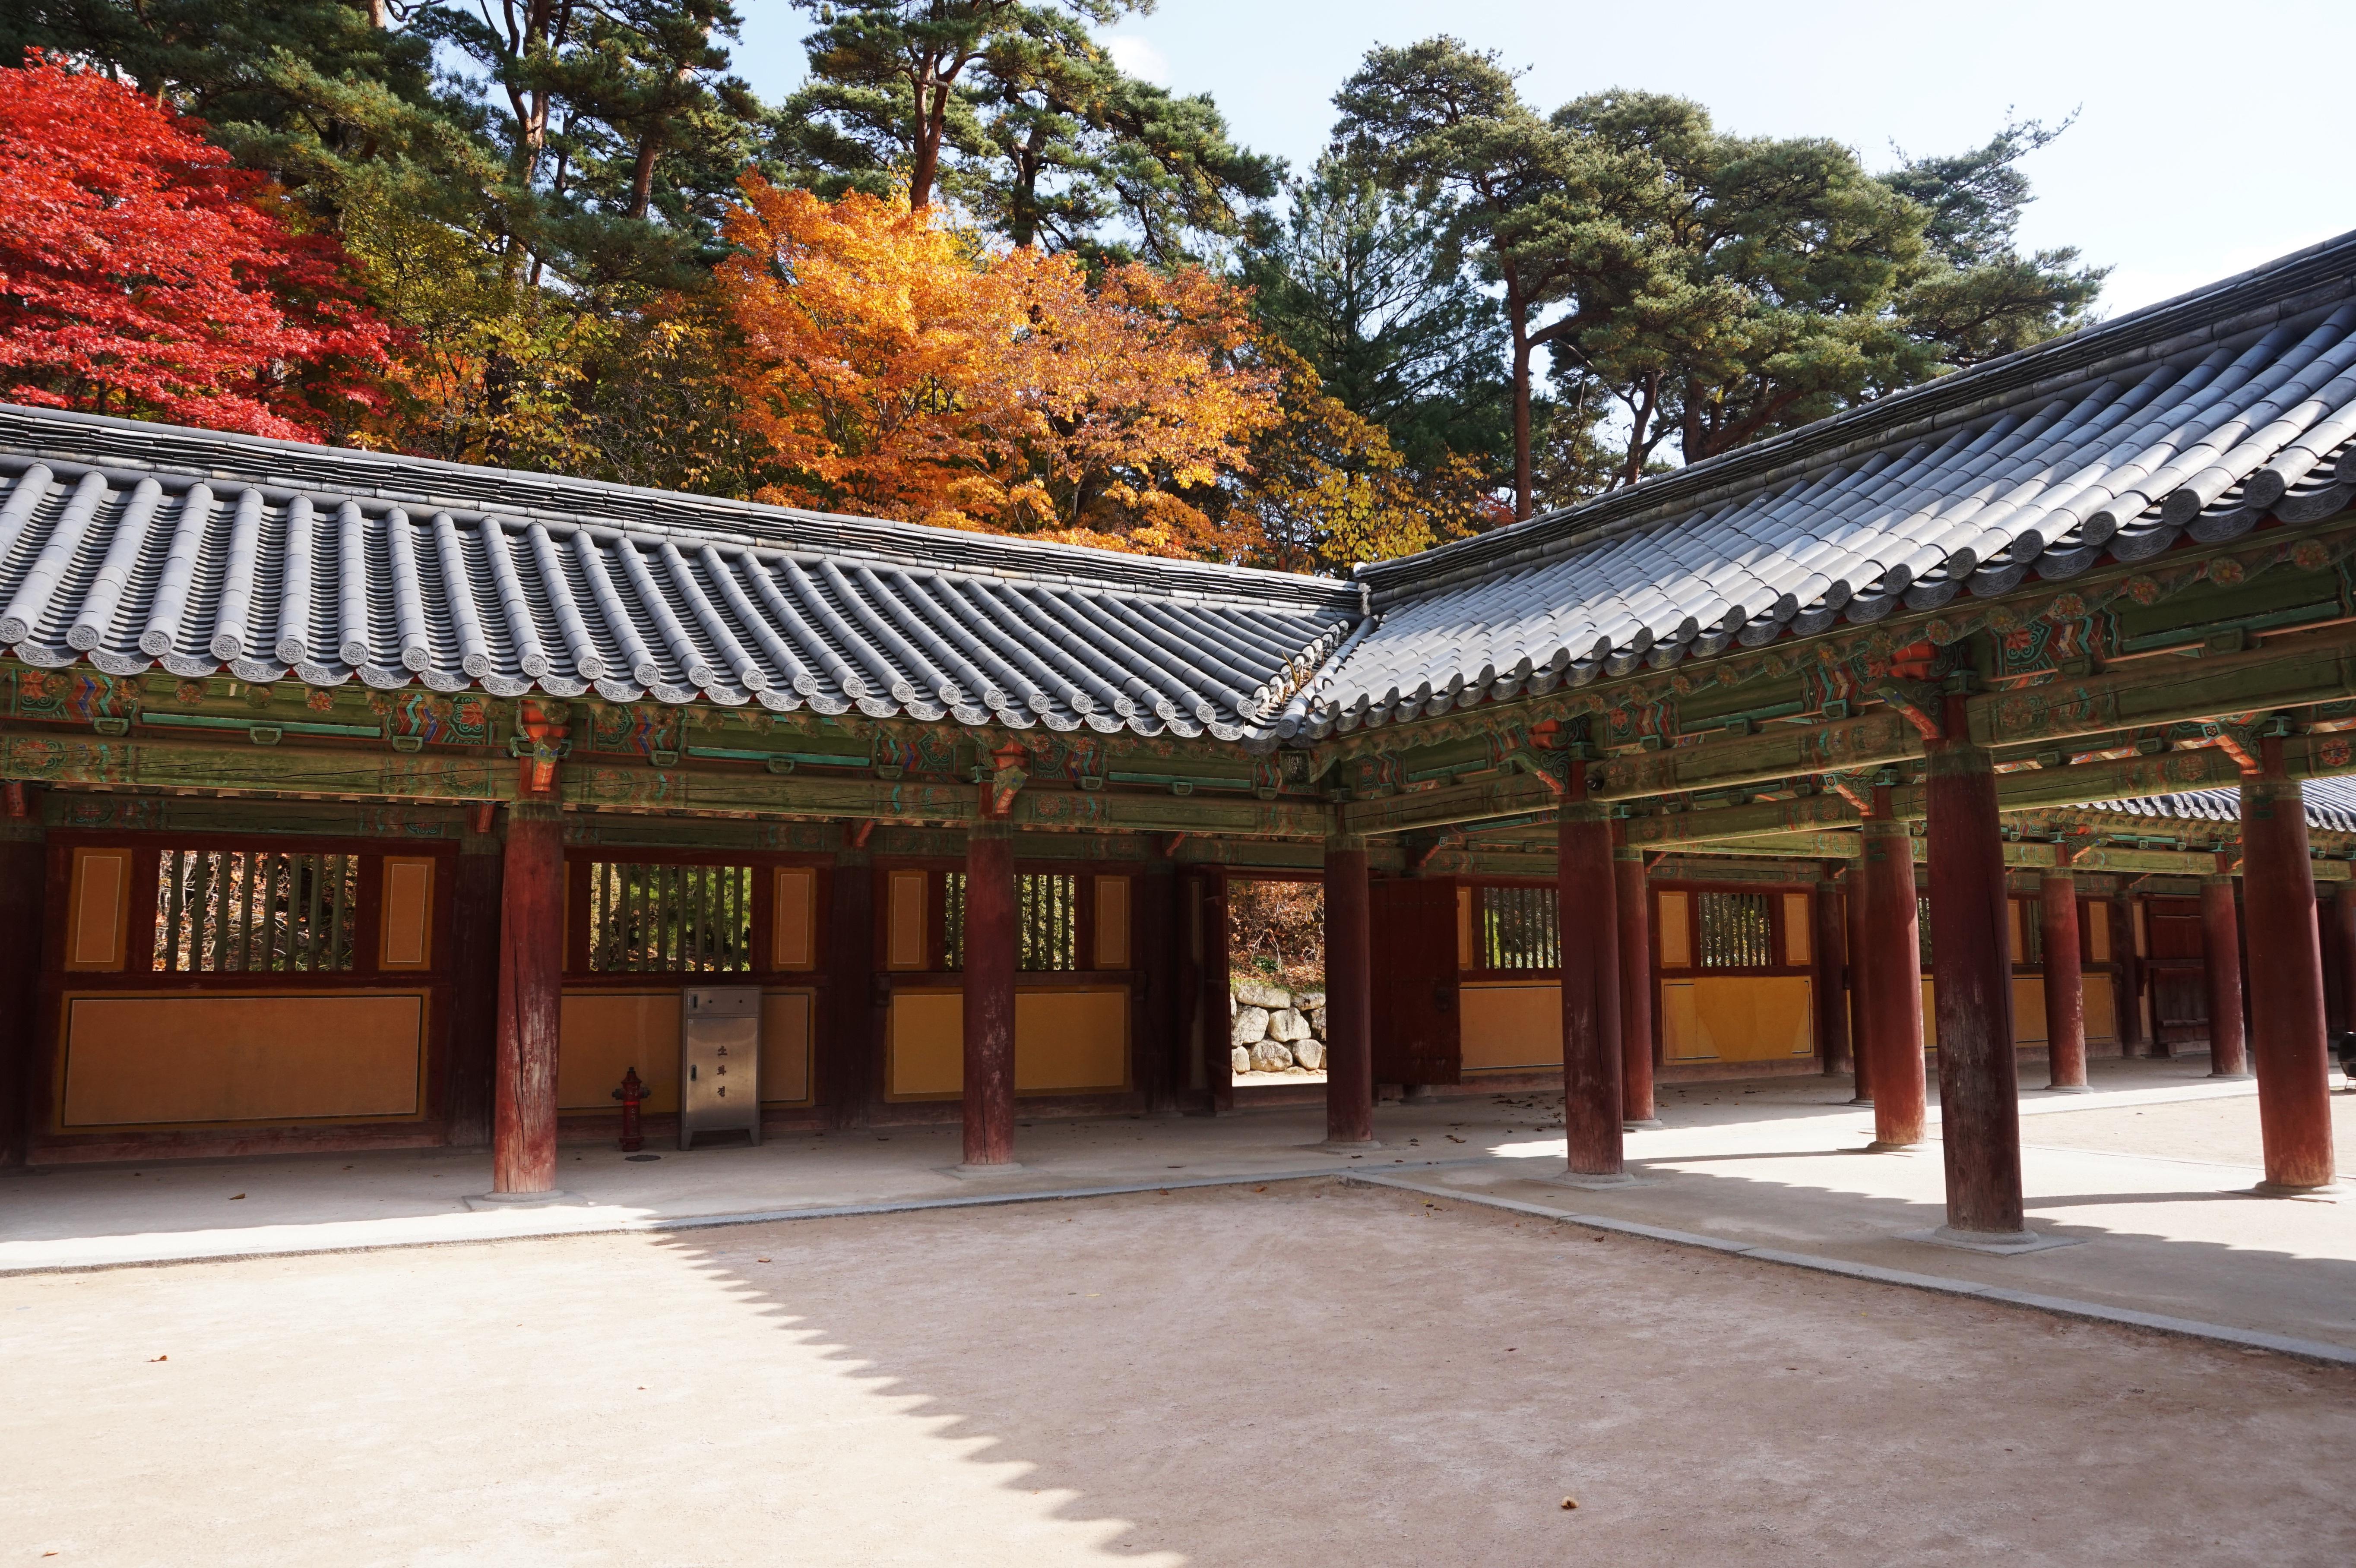 Religion Tourism Place Of Worship Racing Pavilion Buddha Tourist Destination Republic Korea Hanok Traditional Temples South Section